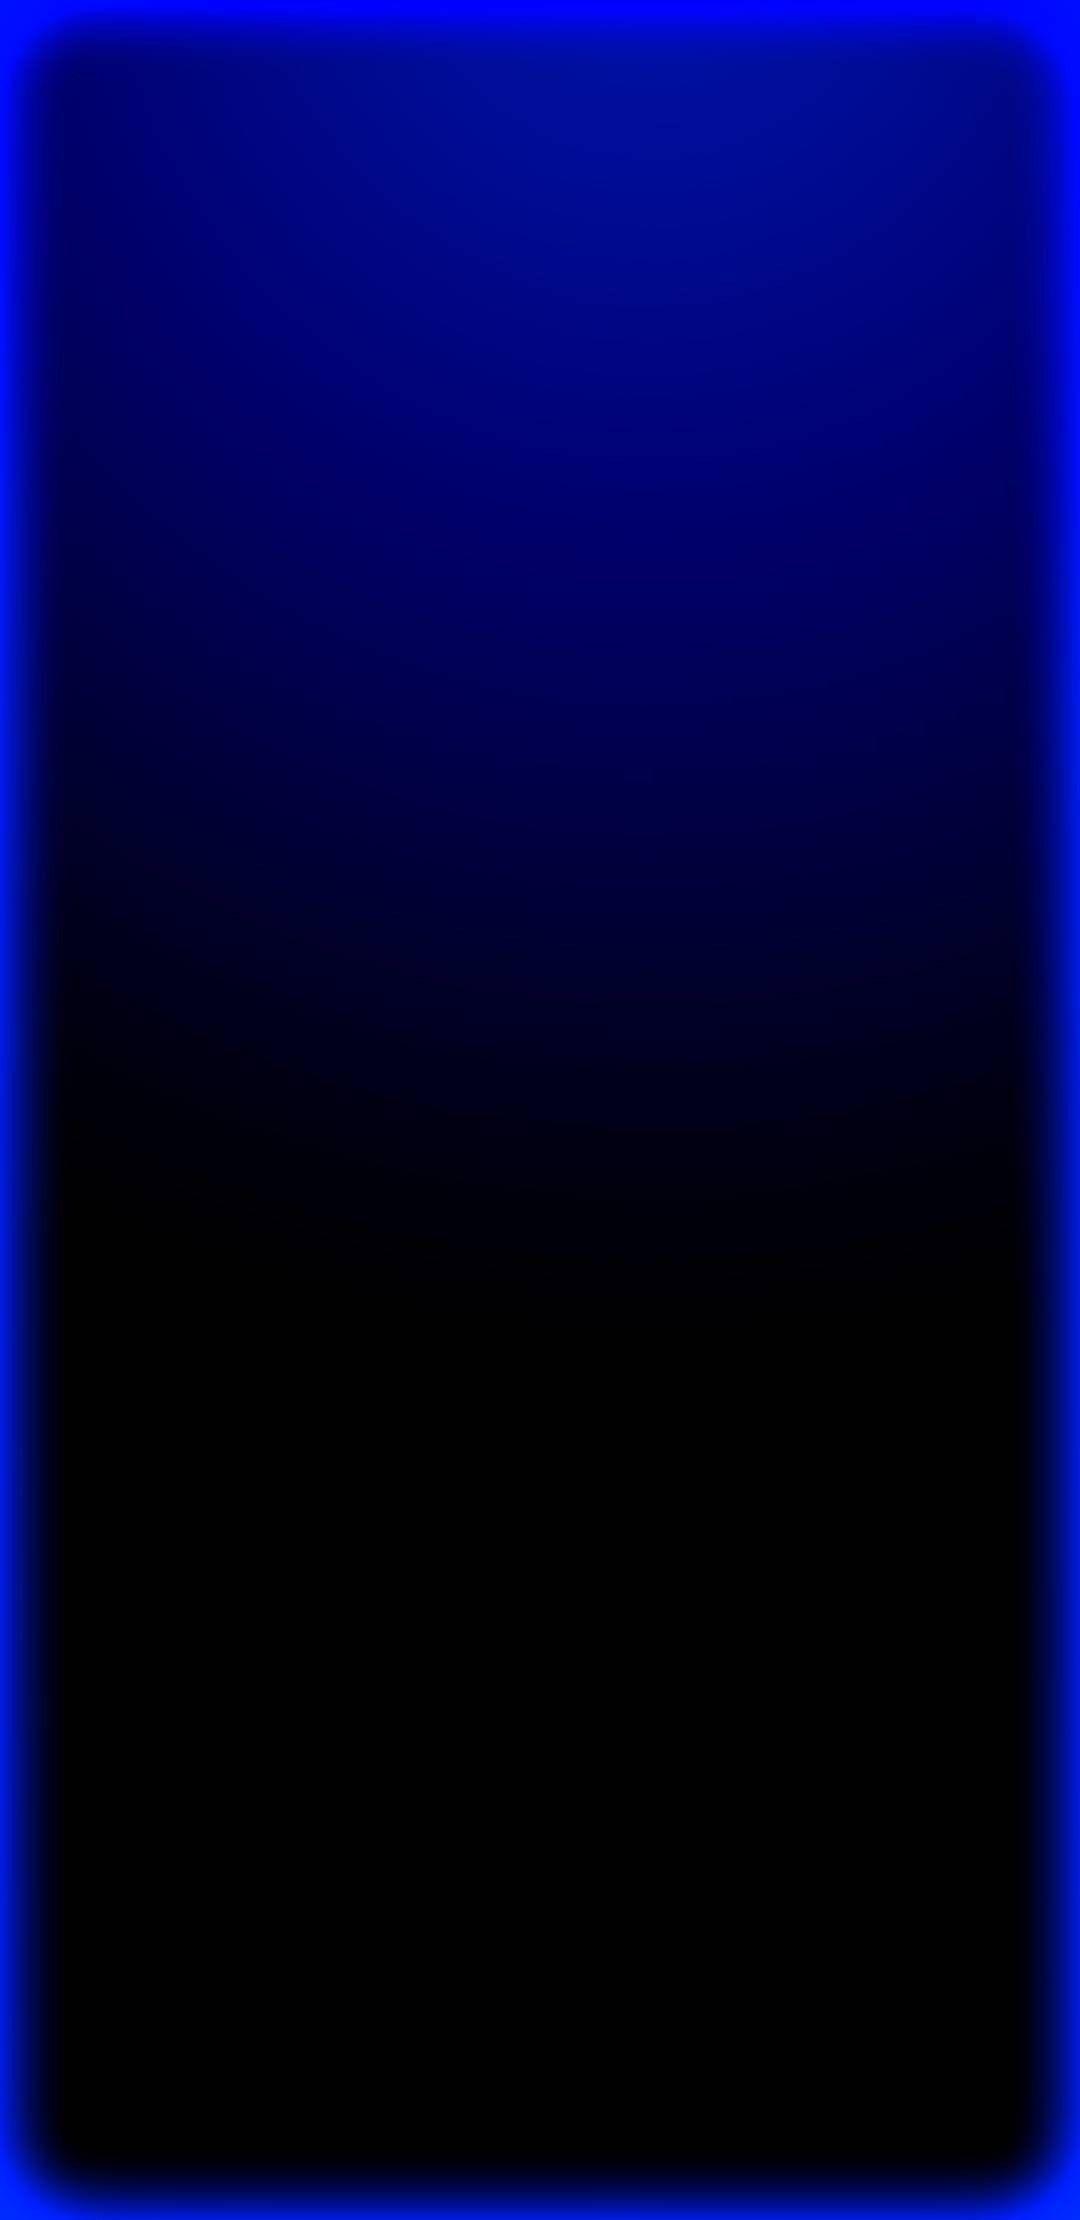 Pin By Hadi Demir On Samsung Iphone Wallpaper Royal Blue Wallpaper Blue Wallpaper Iphone Blue Wallpapers